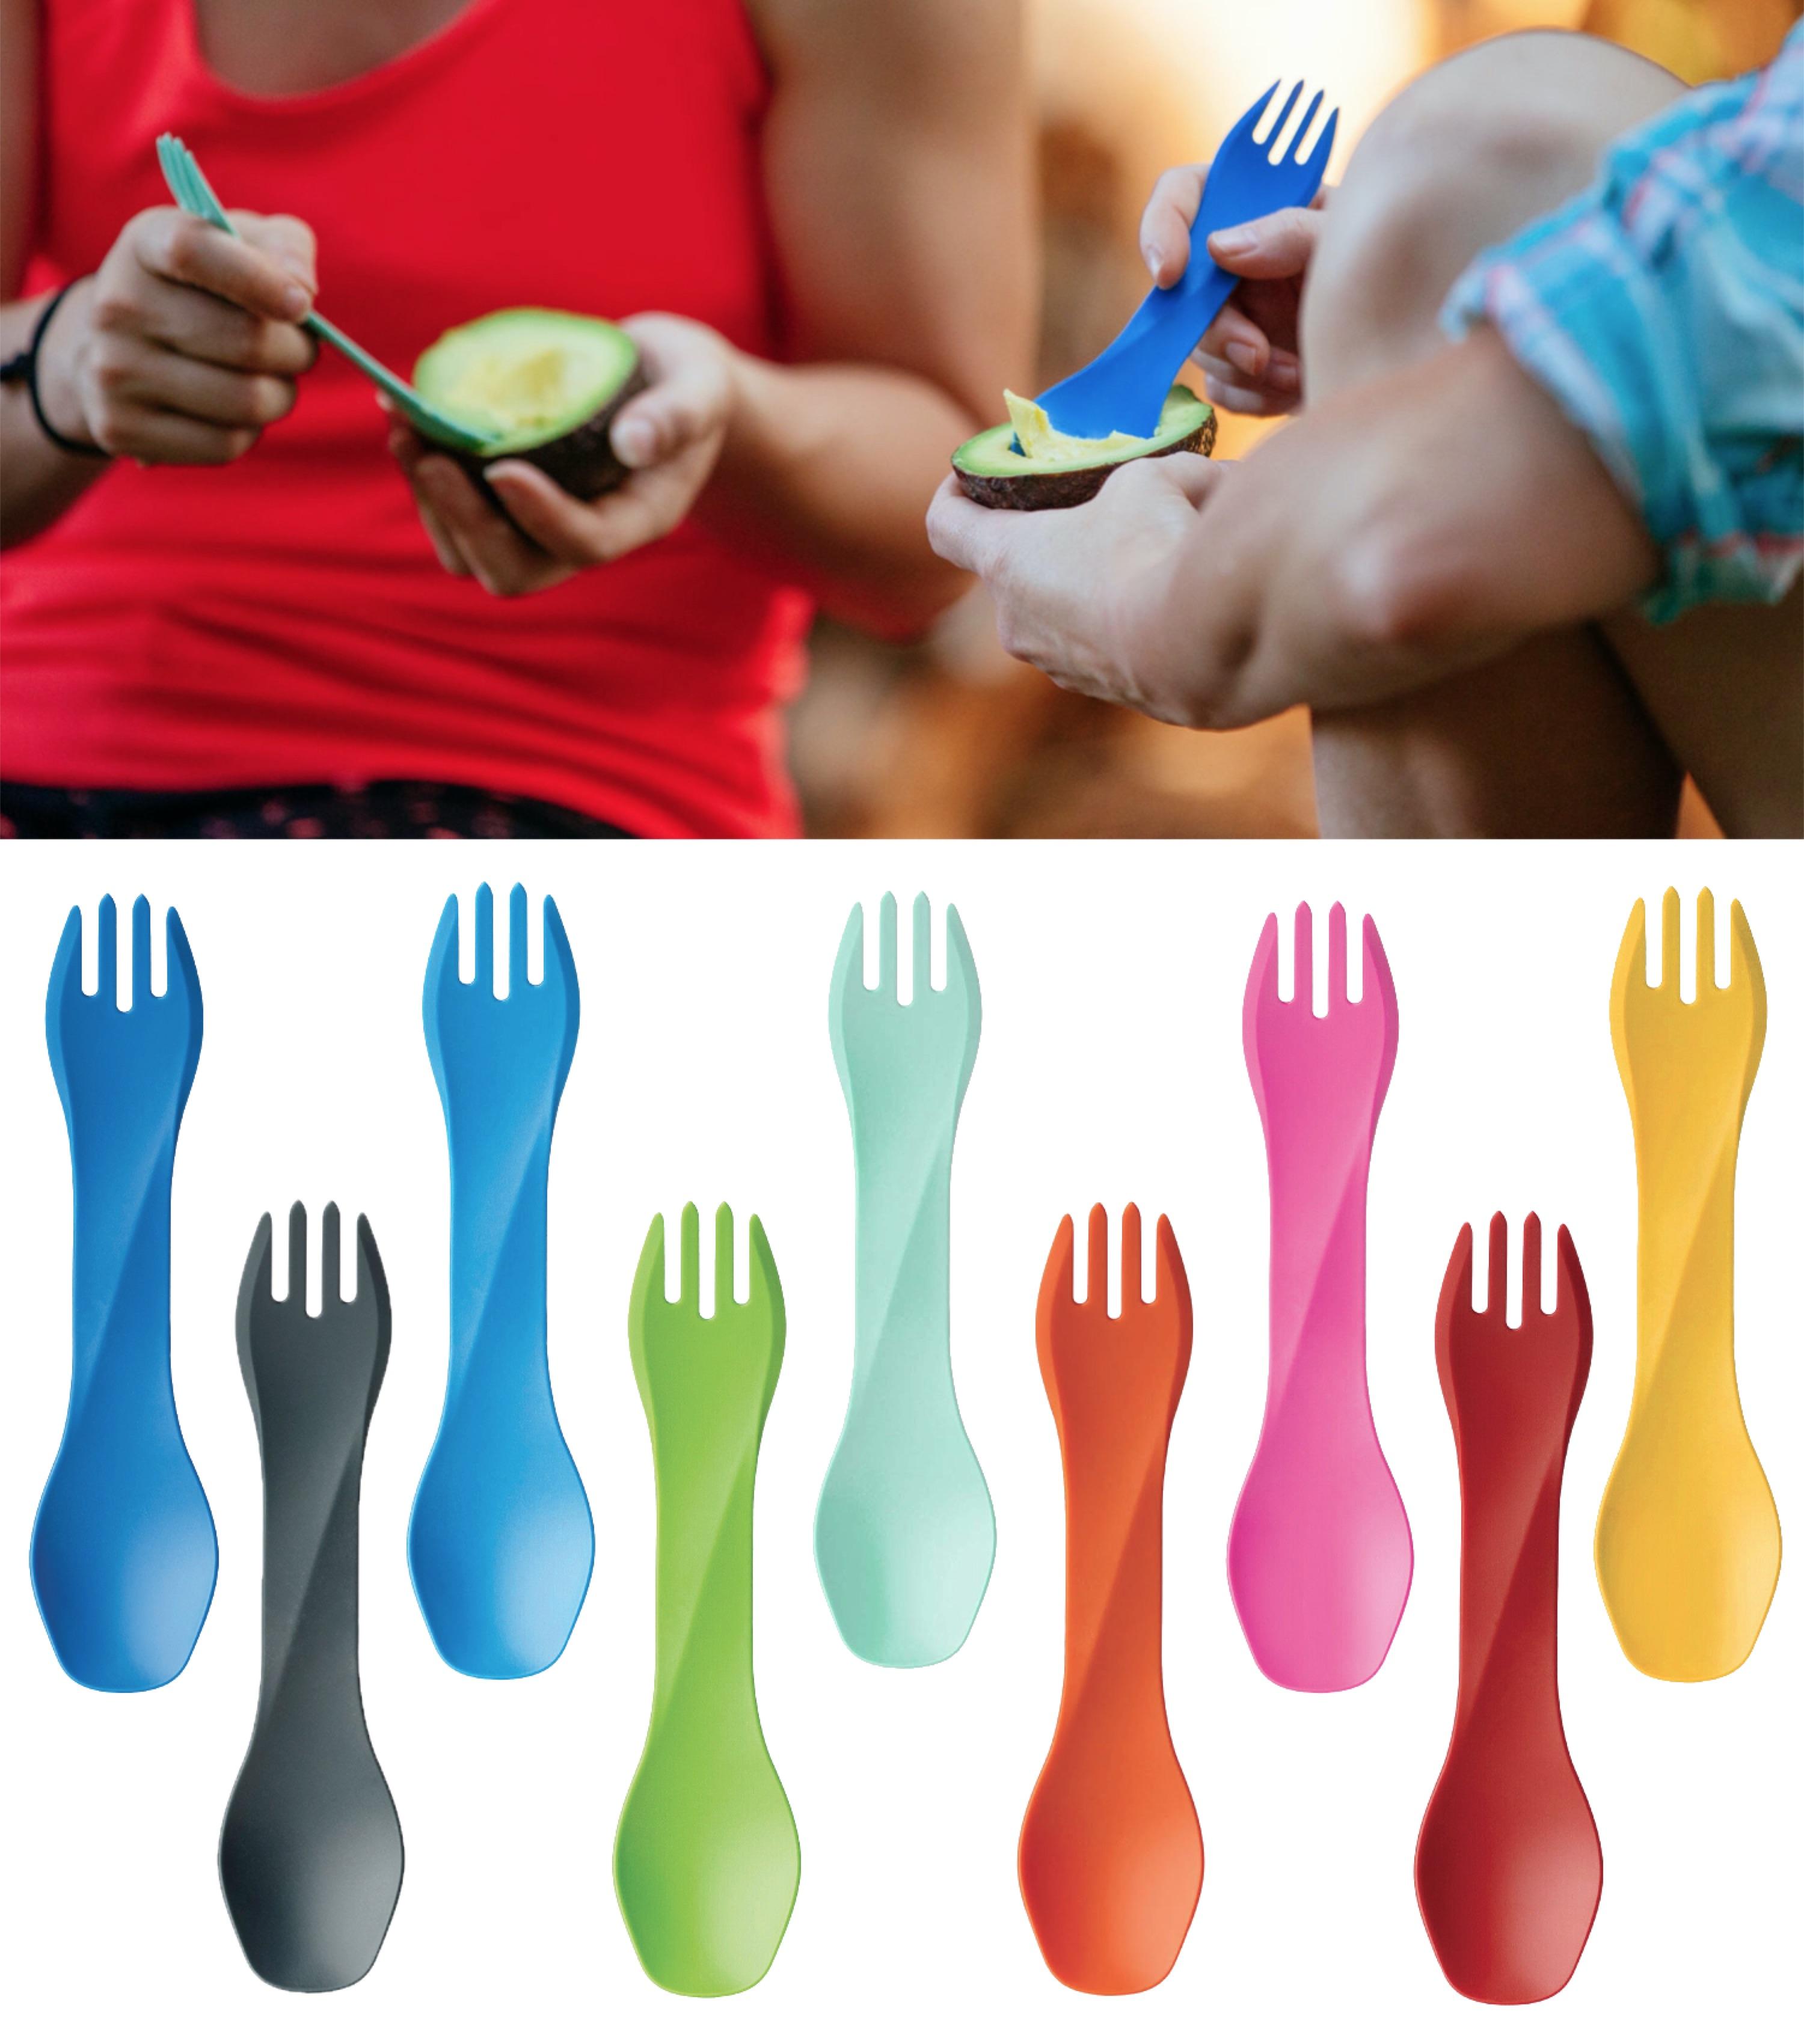 Human Gear GoBites Uno Mini Spoon//Fork Combo Utensil Gray Sturdy BPA-Free Nylon